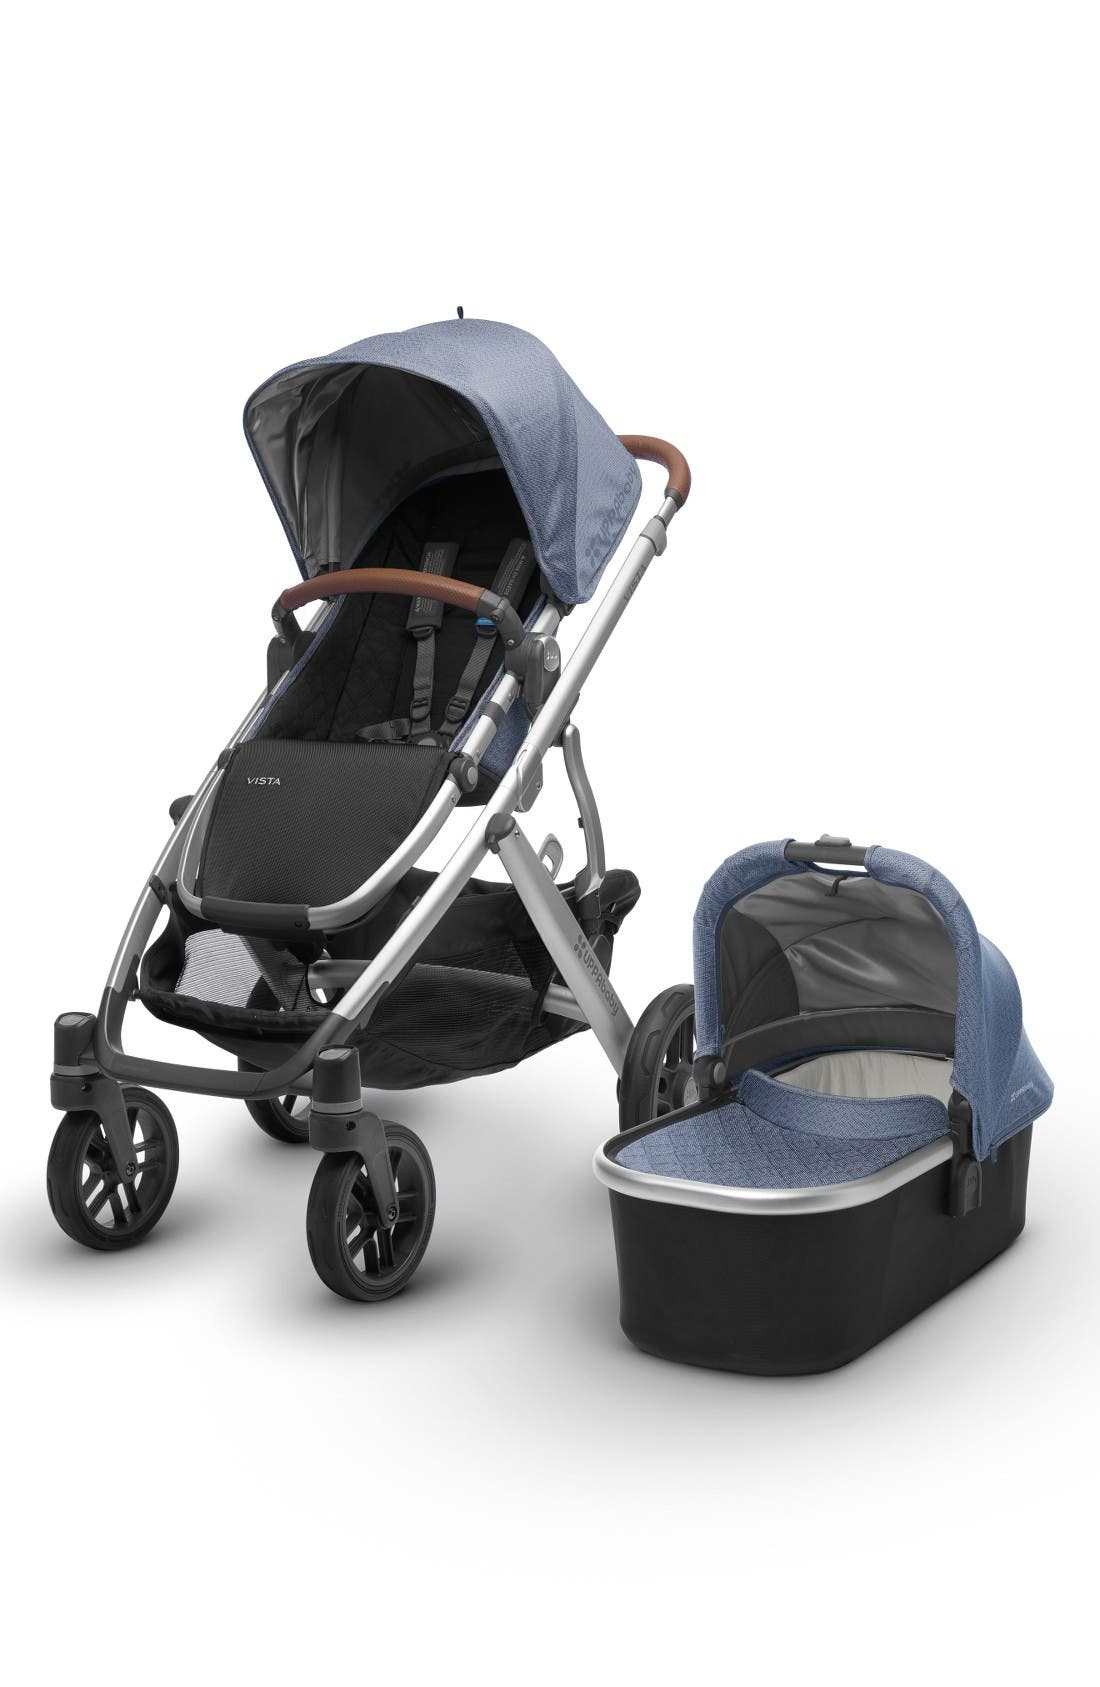 2017 VISTA Henry Aluminum Frame Convertible Stroller with Bassinet & Toddler Seat,                             Main thumbnail 1, color,                             Blue Marl